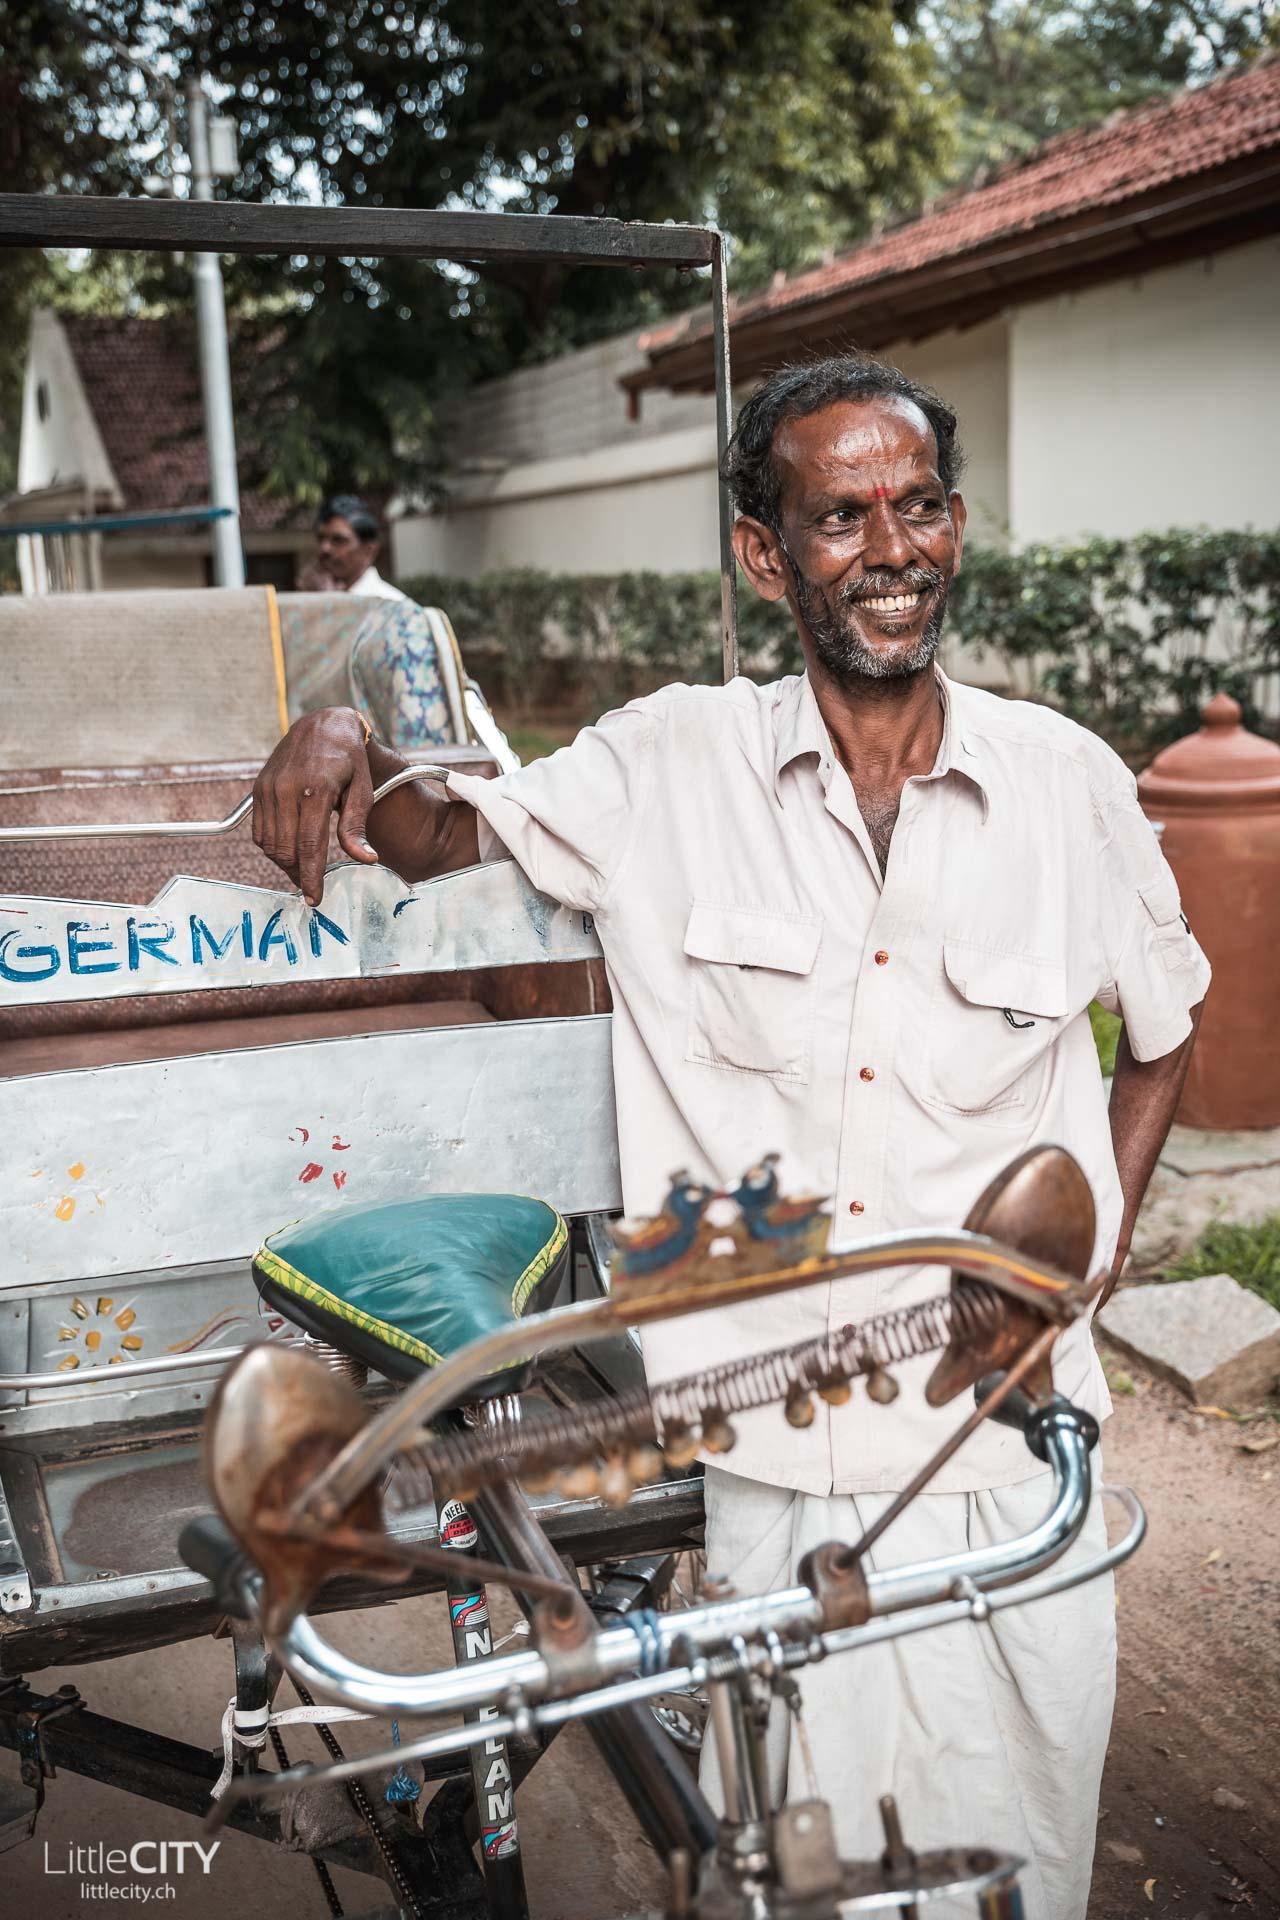 Madirai Tamil Nadu Fahrrad Rikshaw Reise